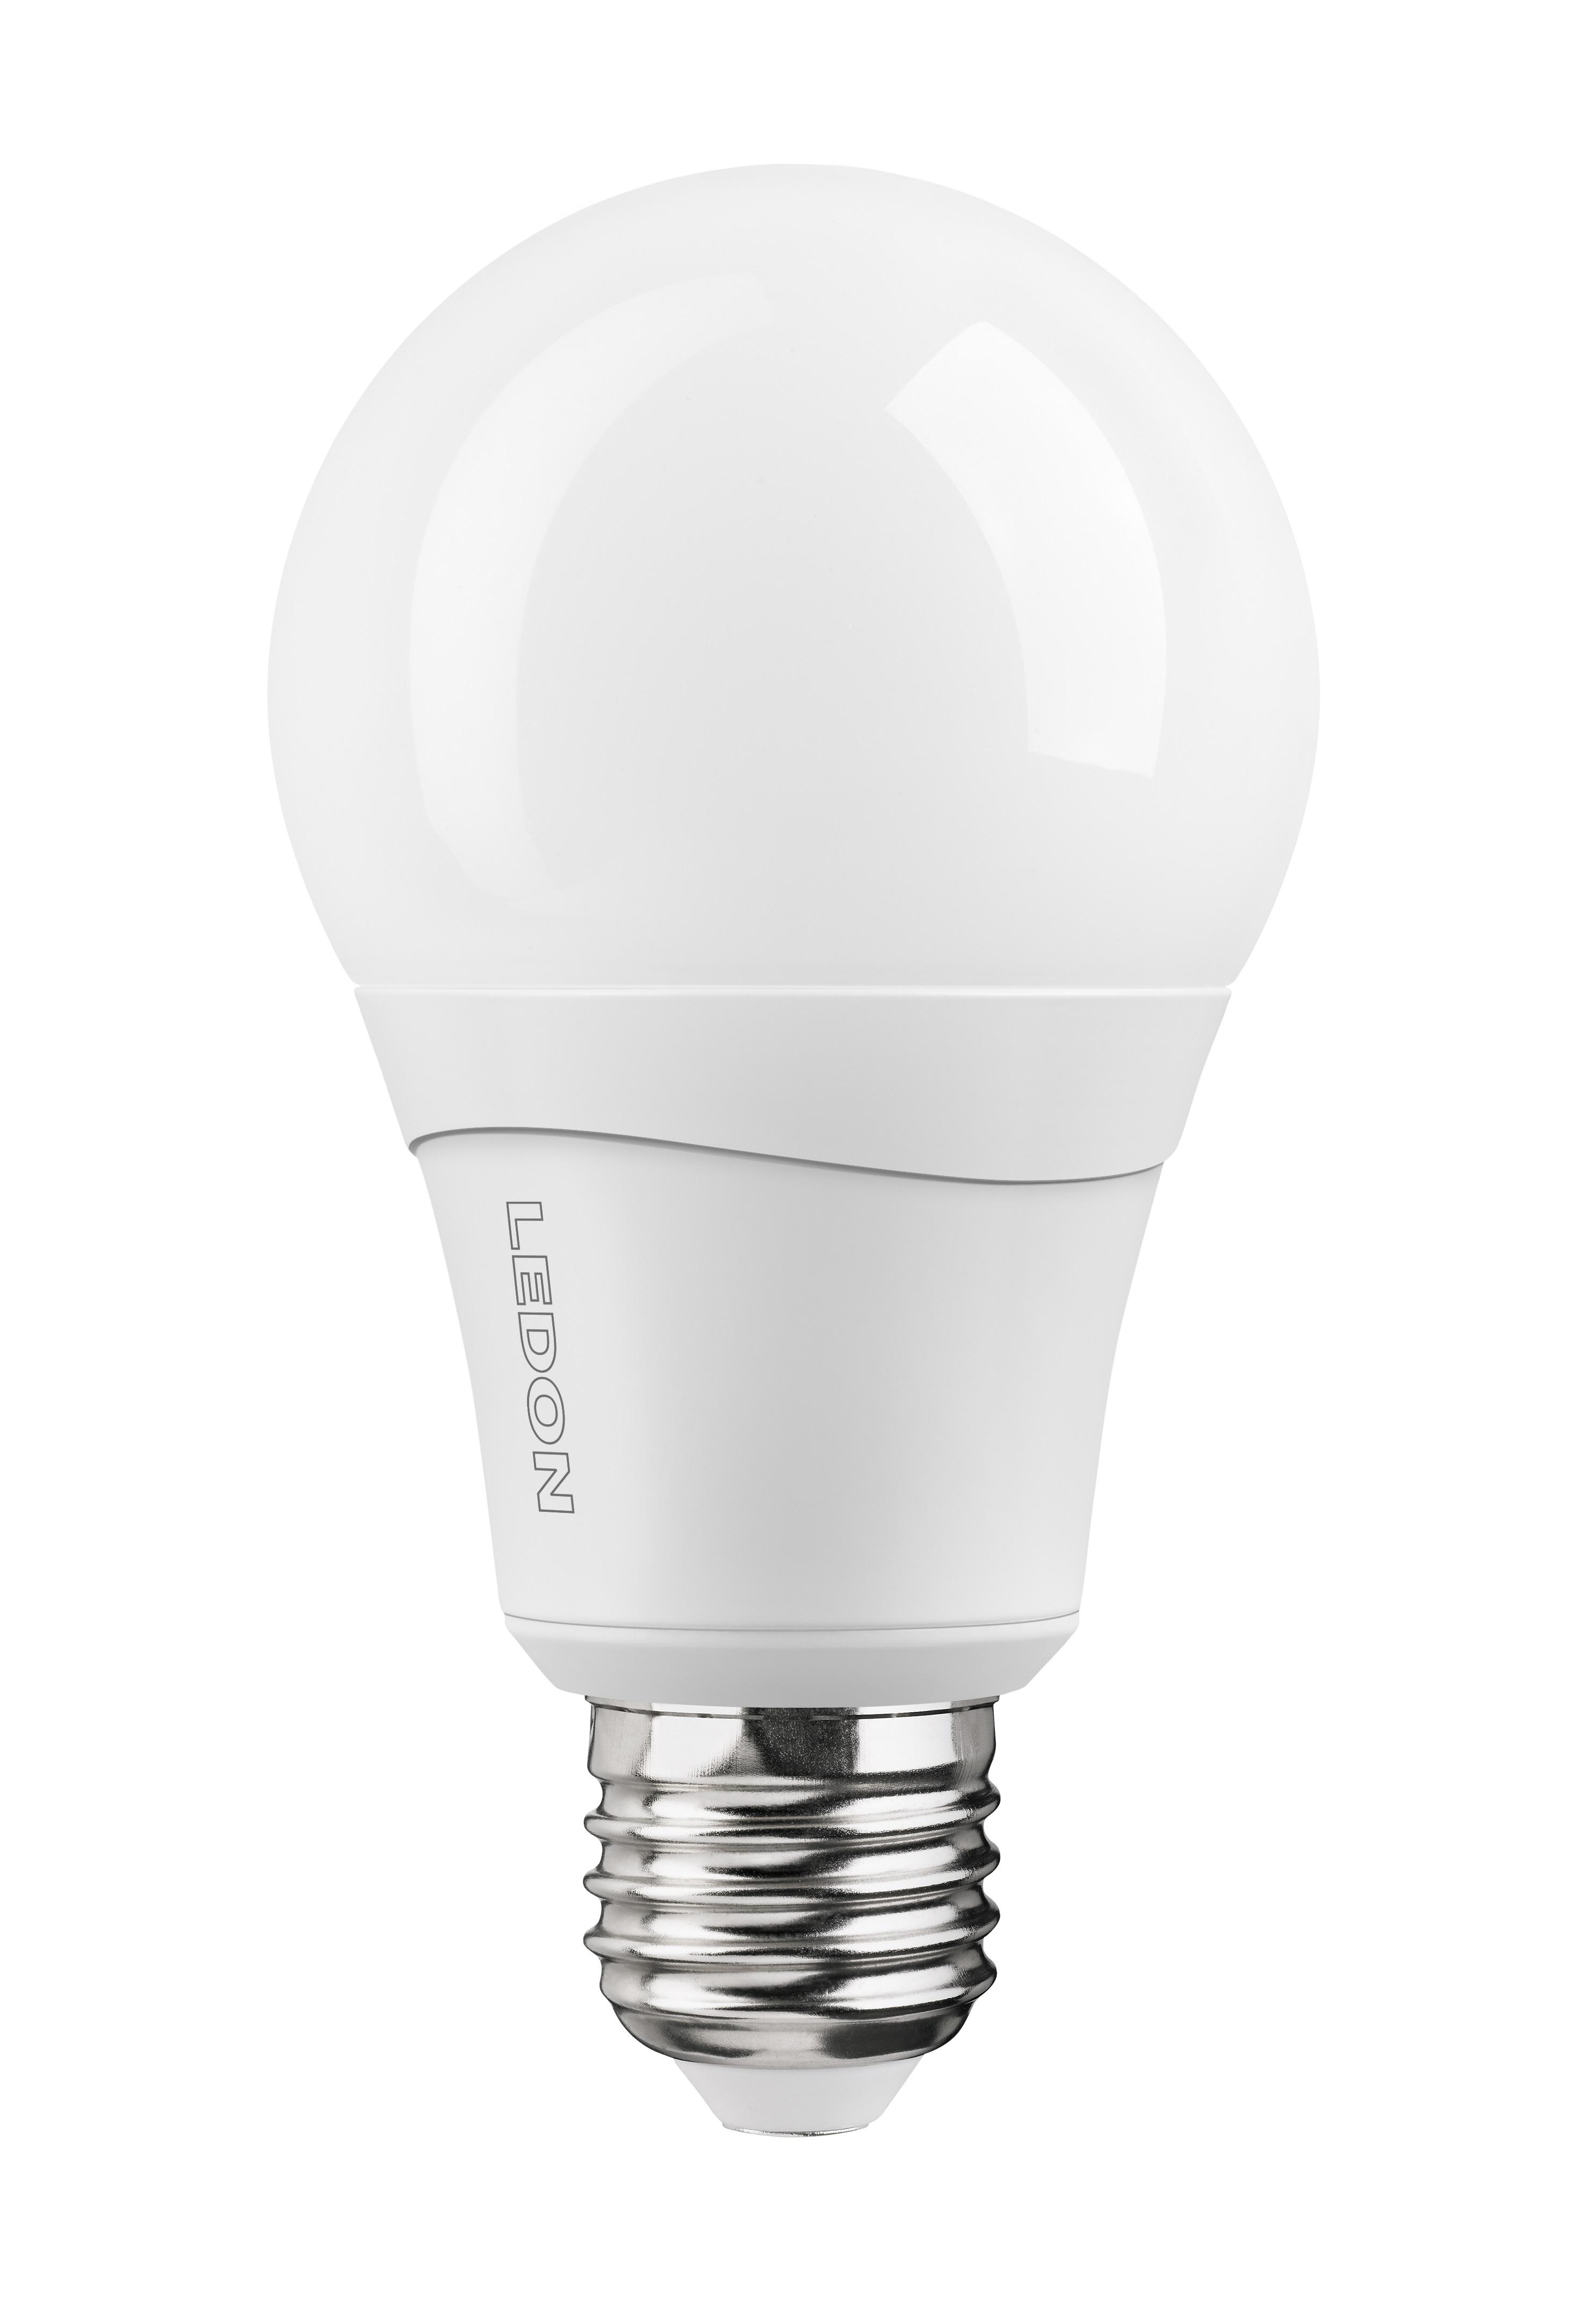 1 Stk LED Lampe A66 10W, 800lm, matt, 827+840, E27, 230V, Dim LI29001029